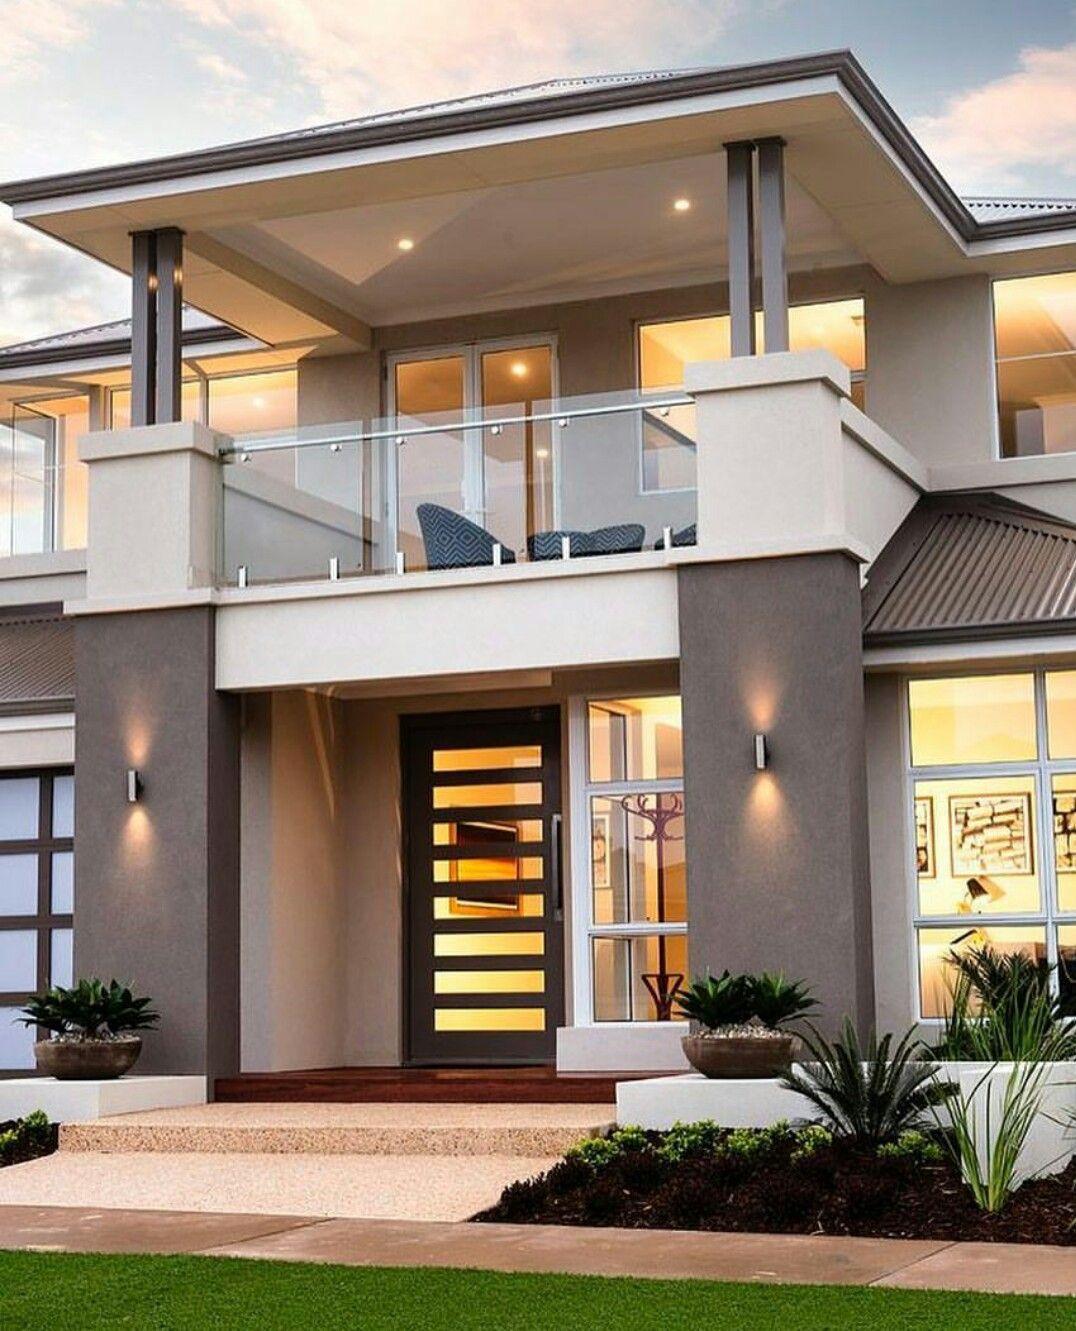 Pin by Melda Avc on arquitectura Modern minimalist house F